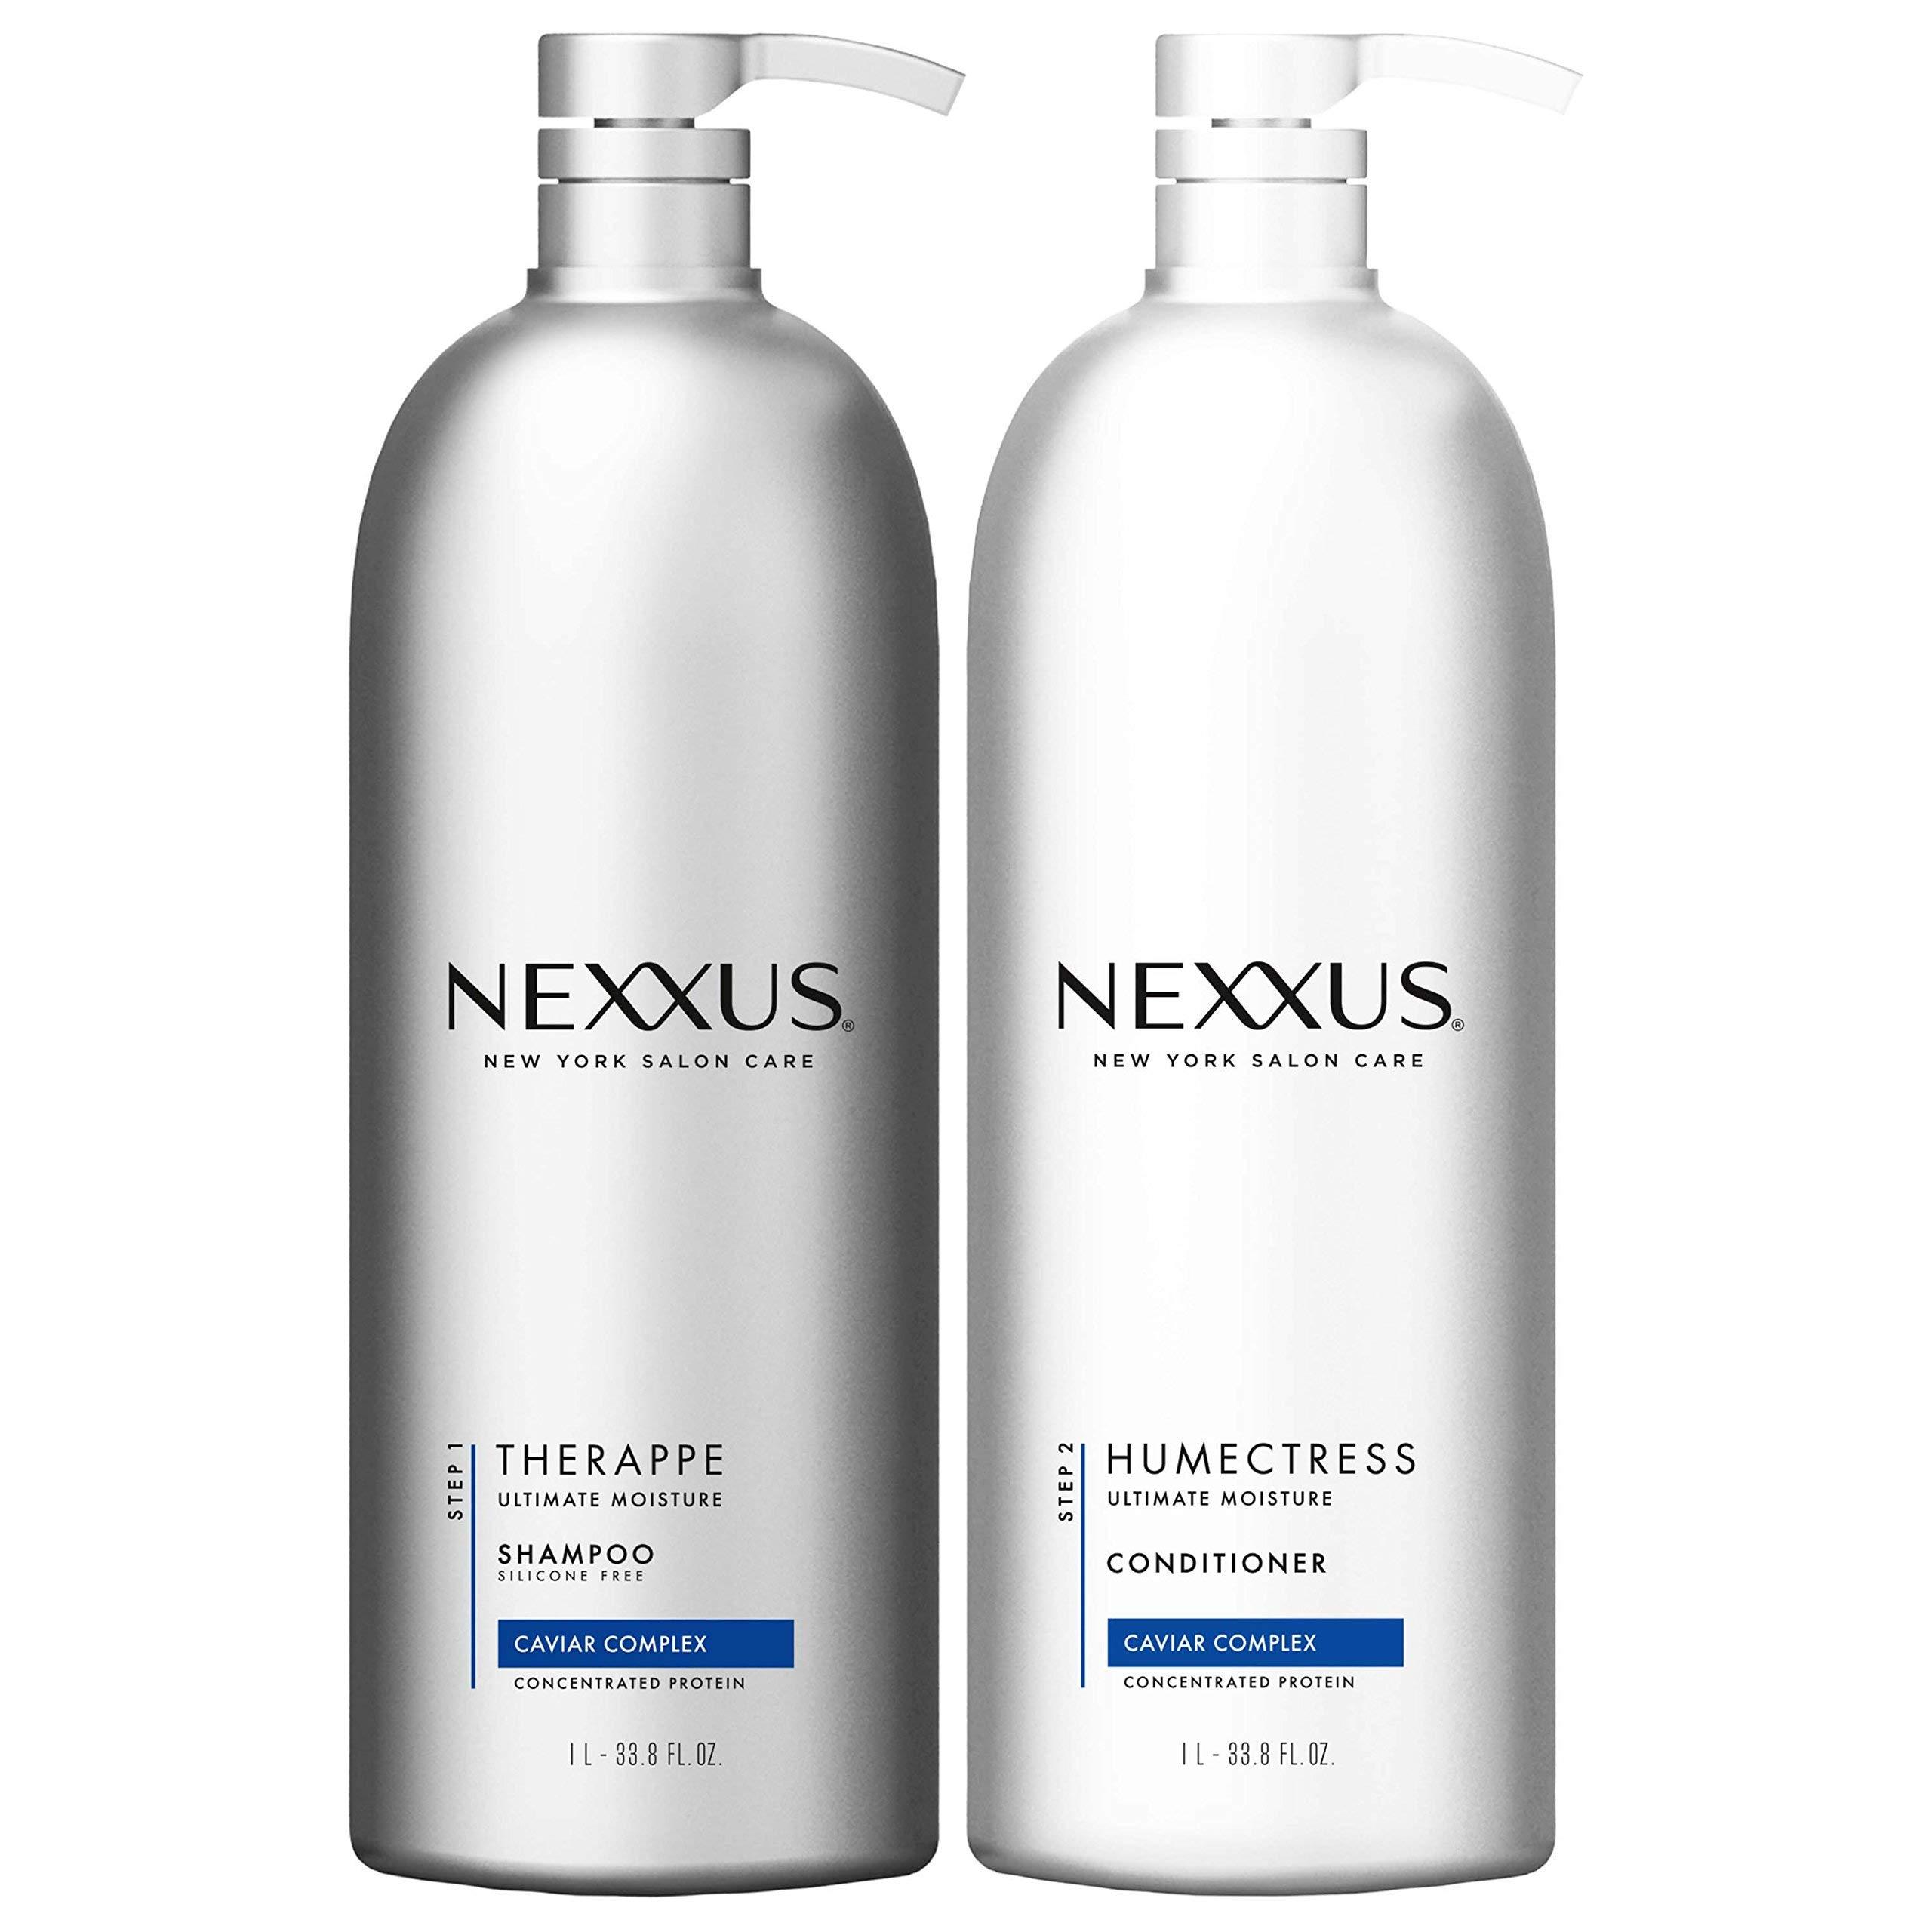 Nexxus Deep Hair Hydration Therappe Caviar Complex 33.8 floz and Humectress Caviar Complex Conditioner 33.8 floz by Nexxus